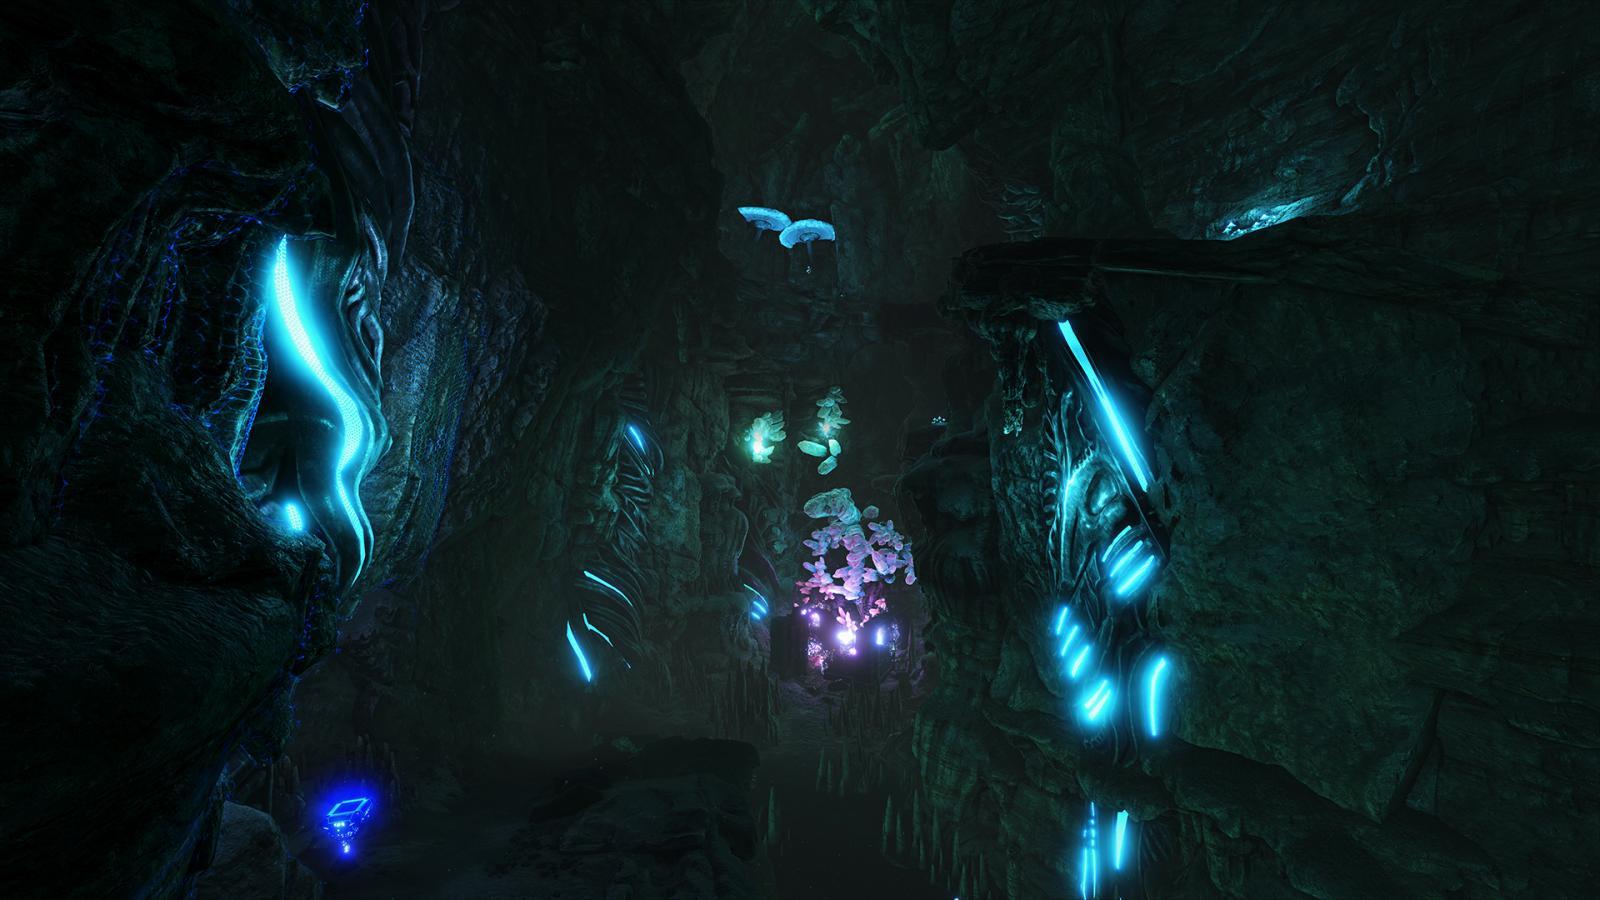 large.58a7b14e55837_EXFIB0-Caves-SuperResolution.jpg